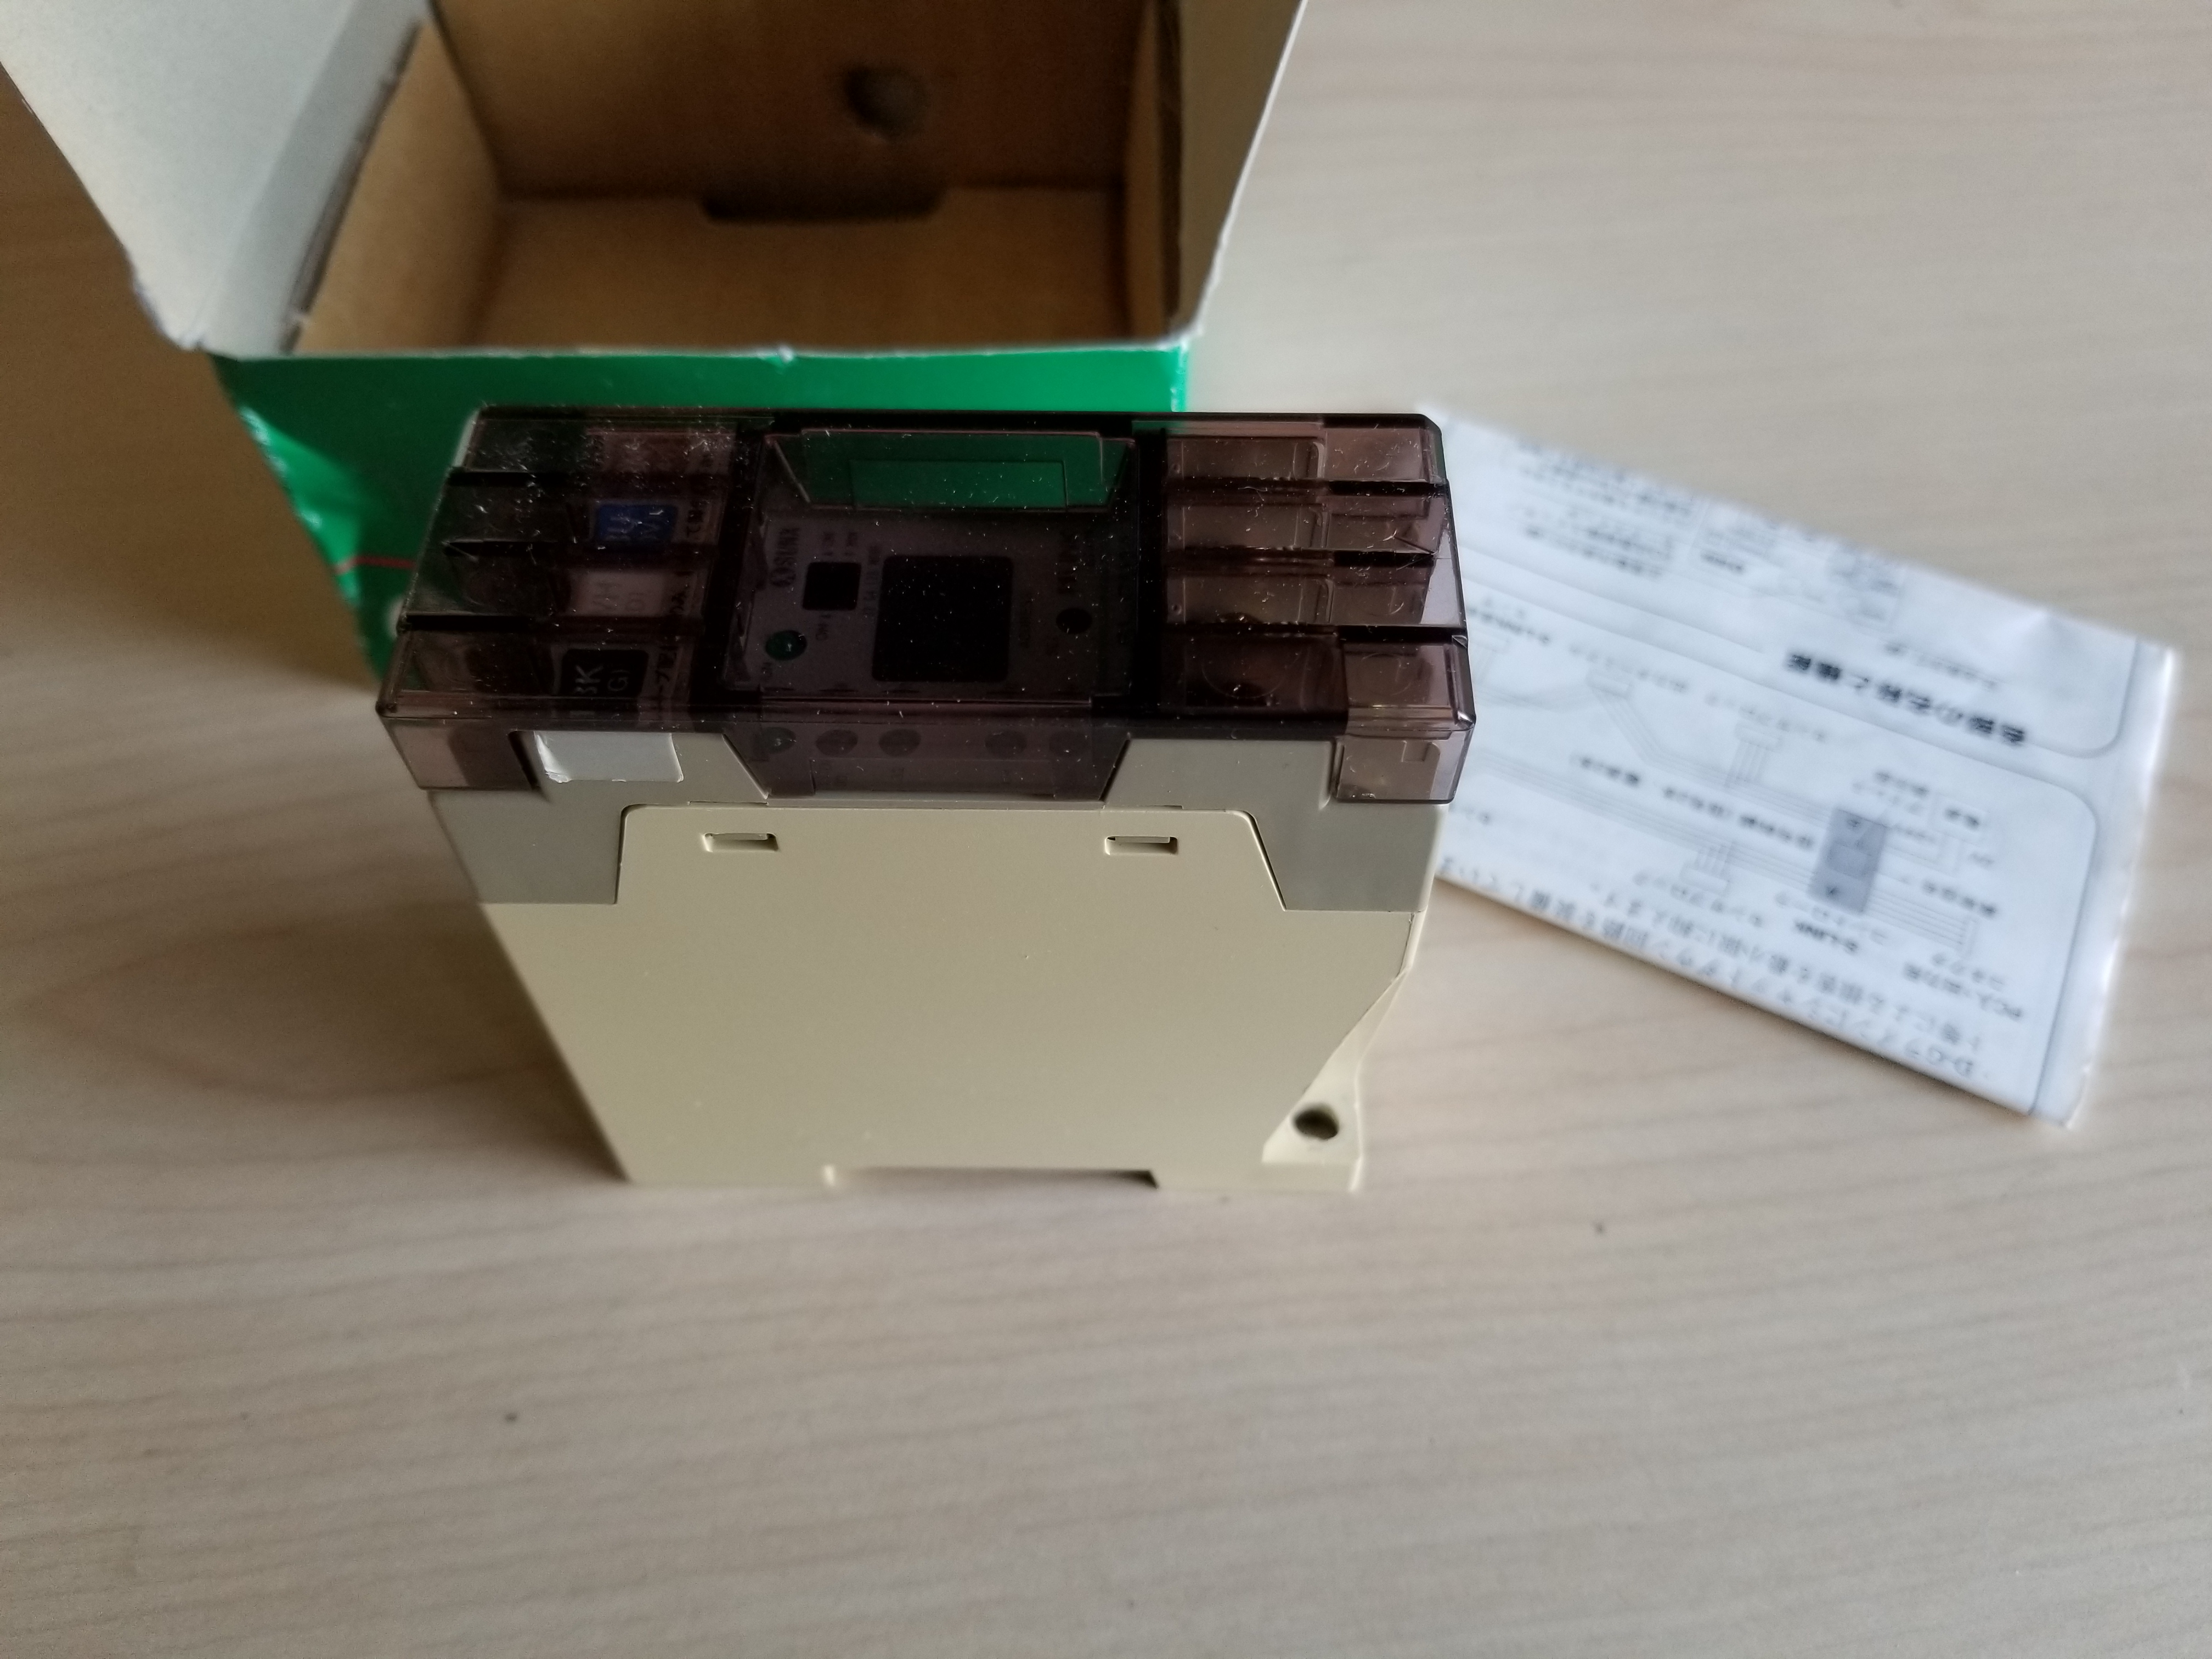 New Sunx S Link Sensor Controller - Image 3 of 5